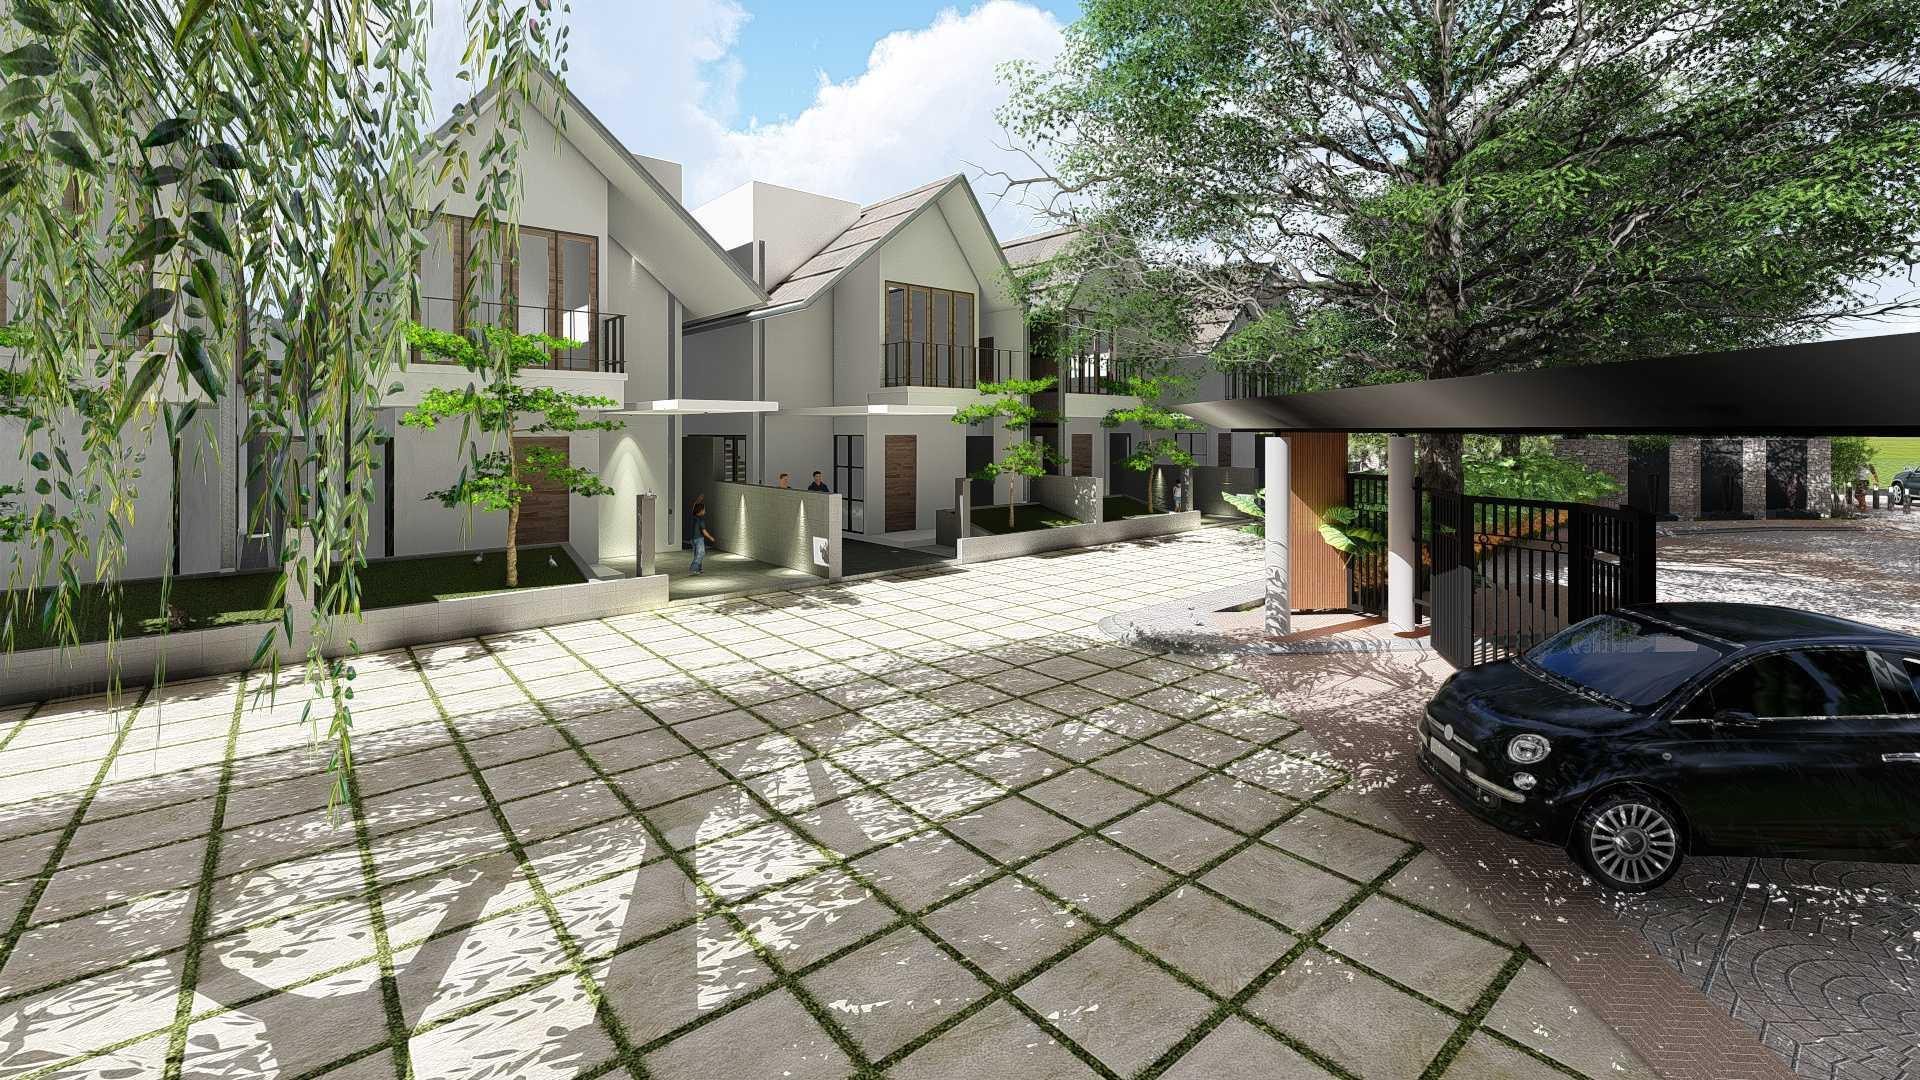 Samitrayasa Design Limo Housing Limo, Kota Depok, Jawa Barat, Indonesia Limo, Kota Depok, Jawa Barat, Indonesia 755 Tropis  32833